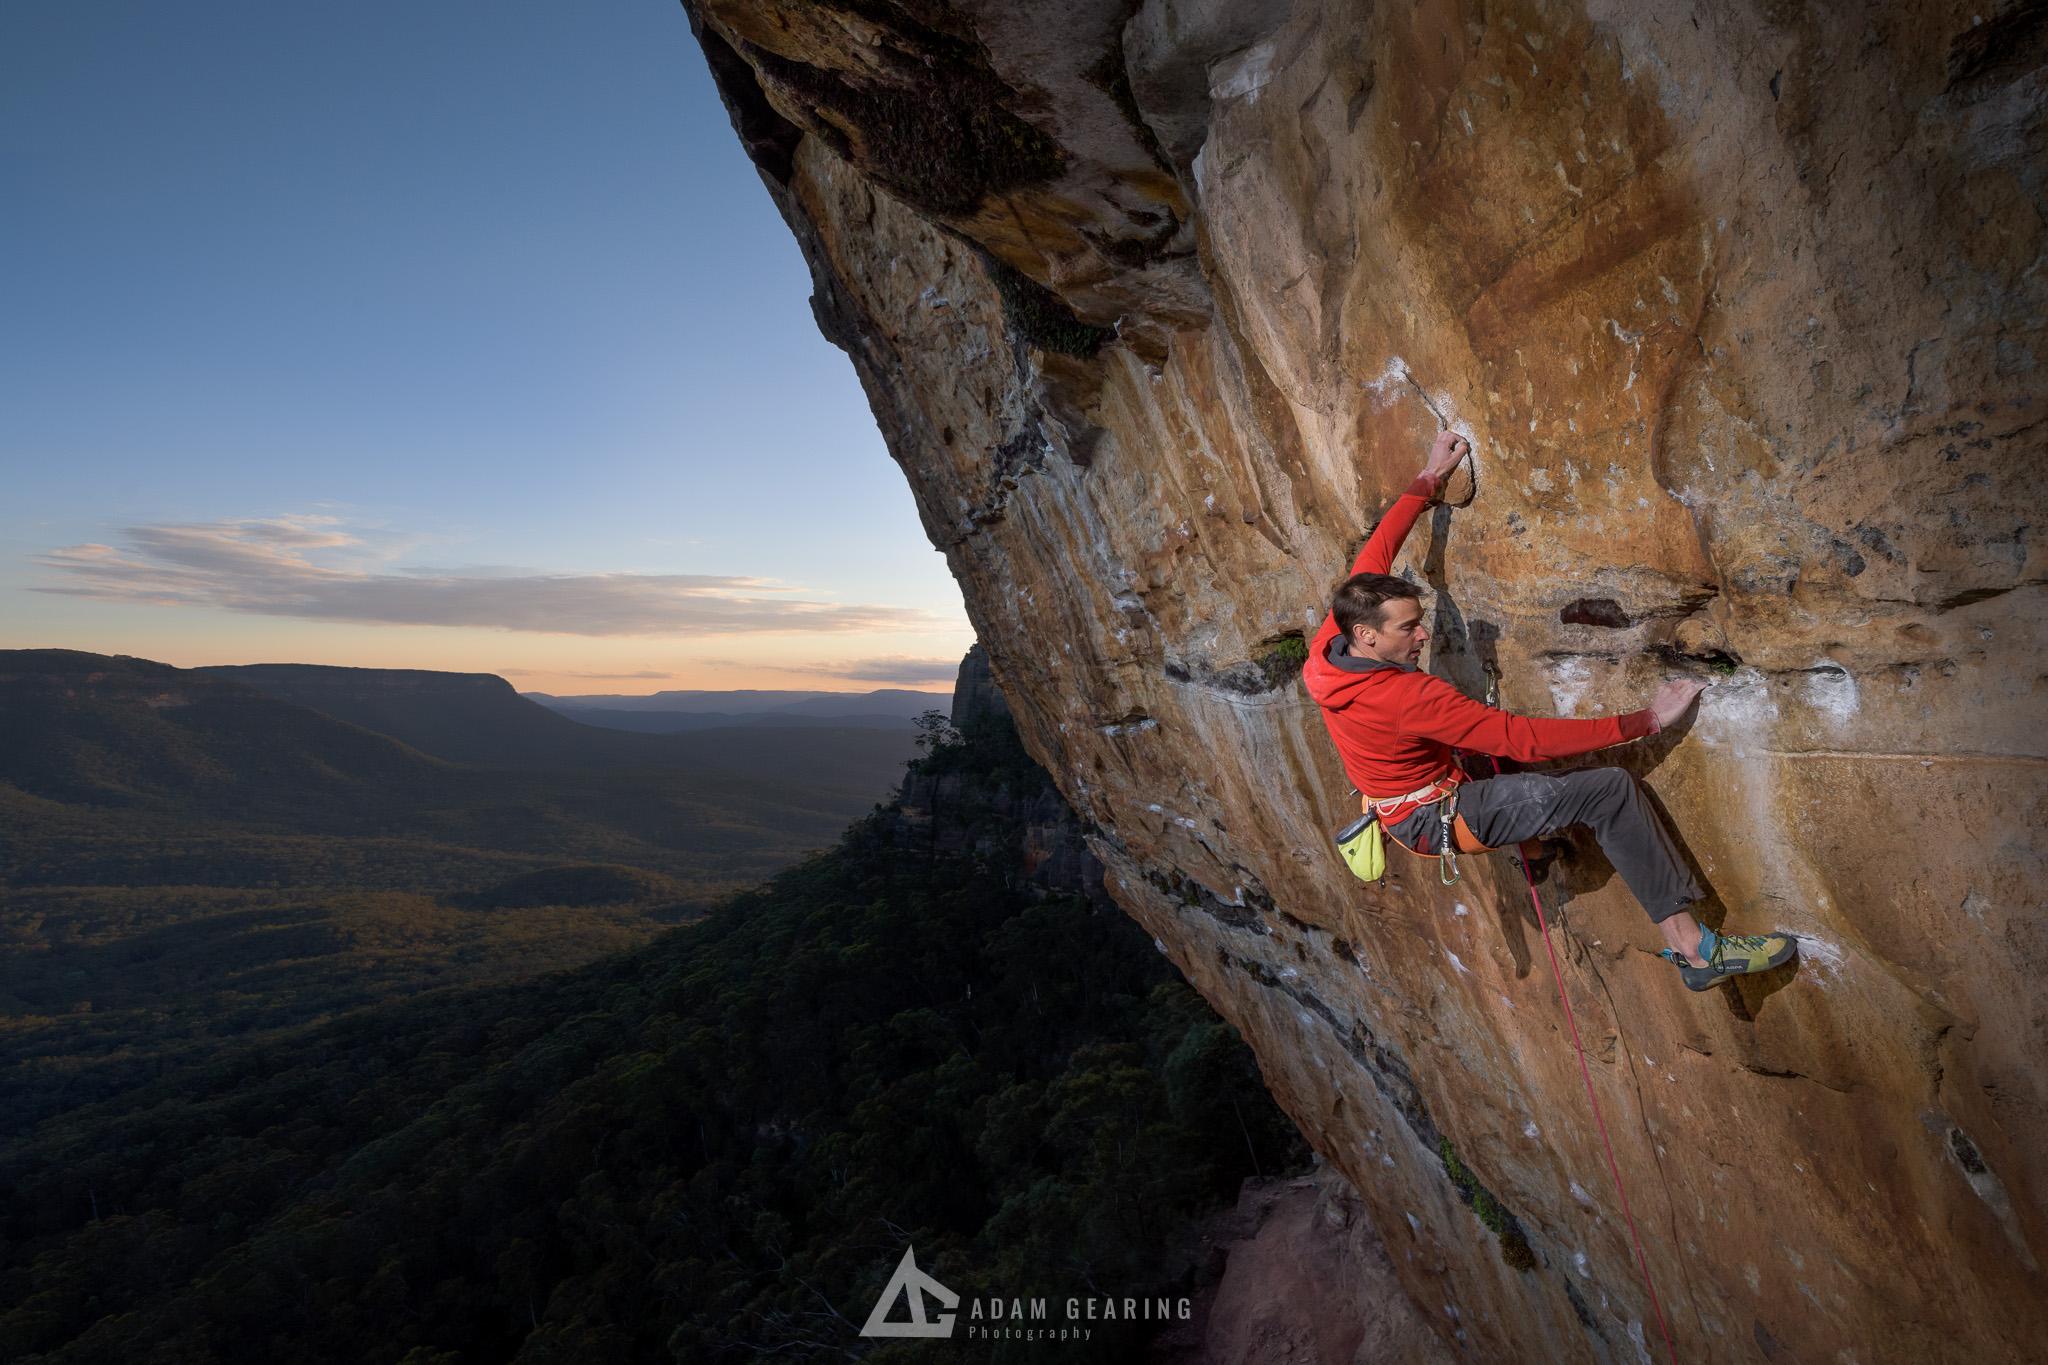 Lee Cujes on Brummel Hook (30) during sunset, Blue Mountains NSW